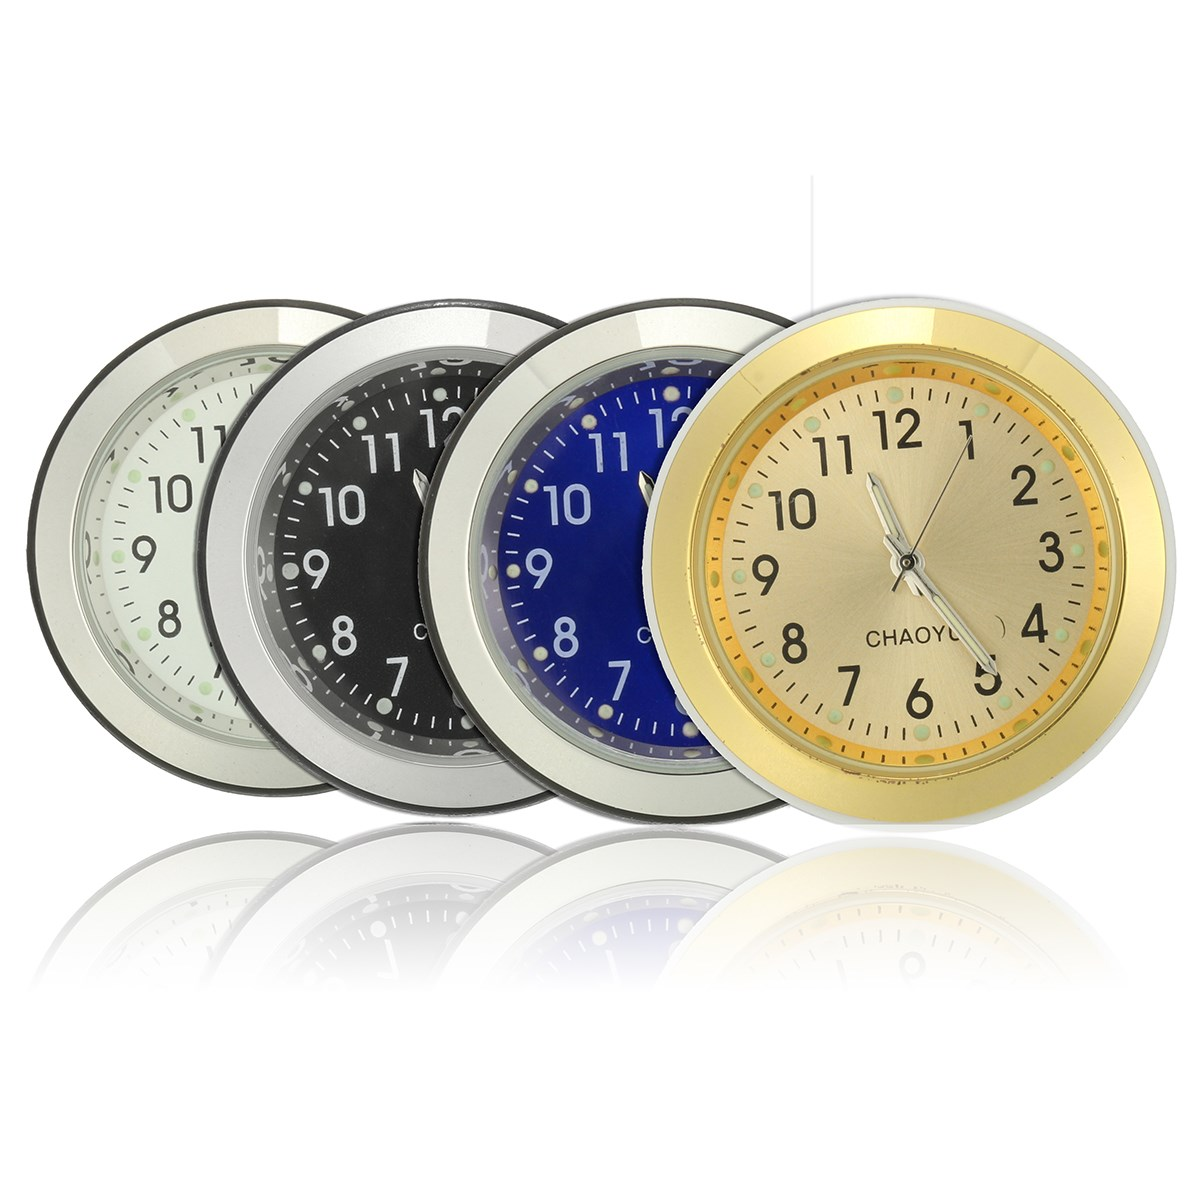 7/8 inch 1'' Universal Motorcycle Bike Handlebar Dial Mount Clock Watch Waterproof Plastic Base Glass Lens цена